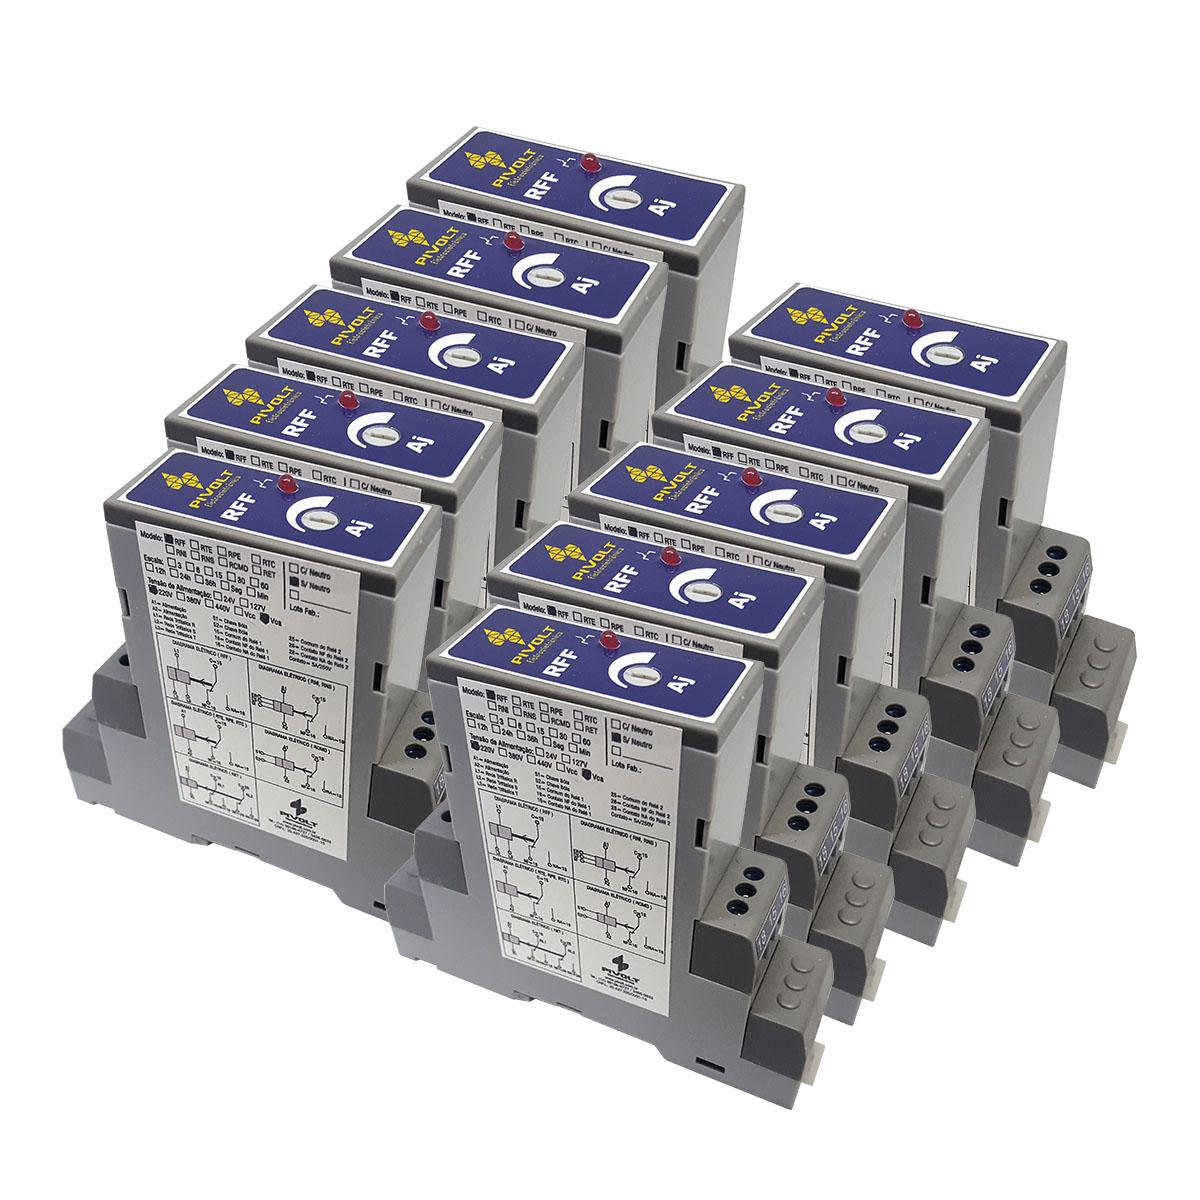 Kit 10 Relés Falta de Fase Trifásico SEM NEUTRO DIN 35mm